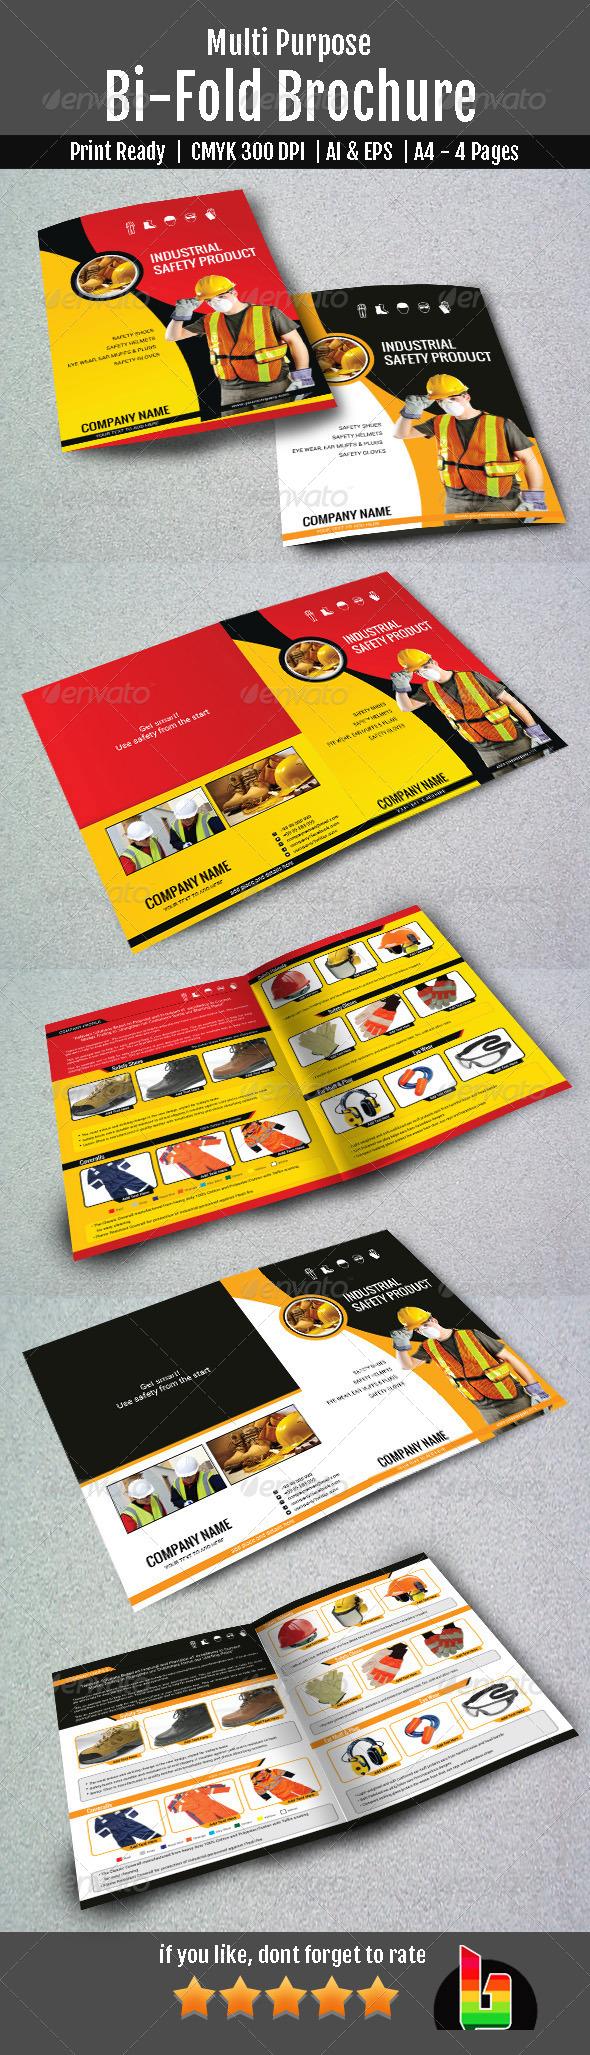 Multipurpose Bifold Brochure - Brochures Print Templates